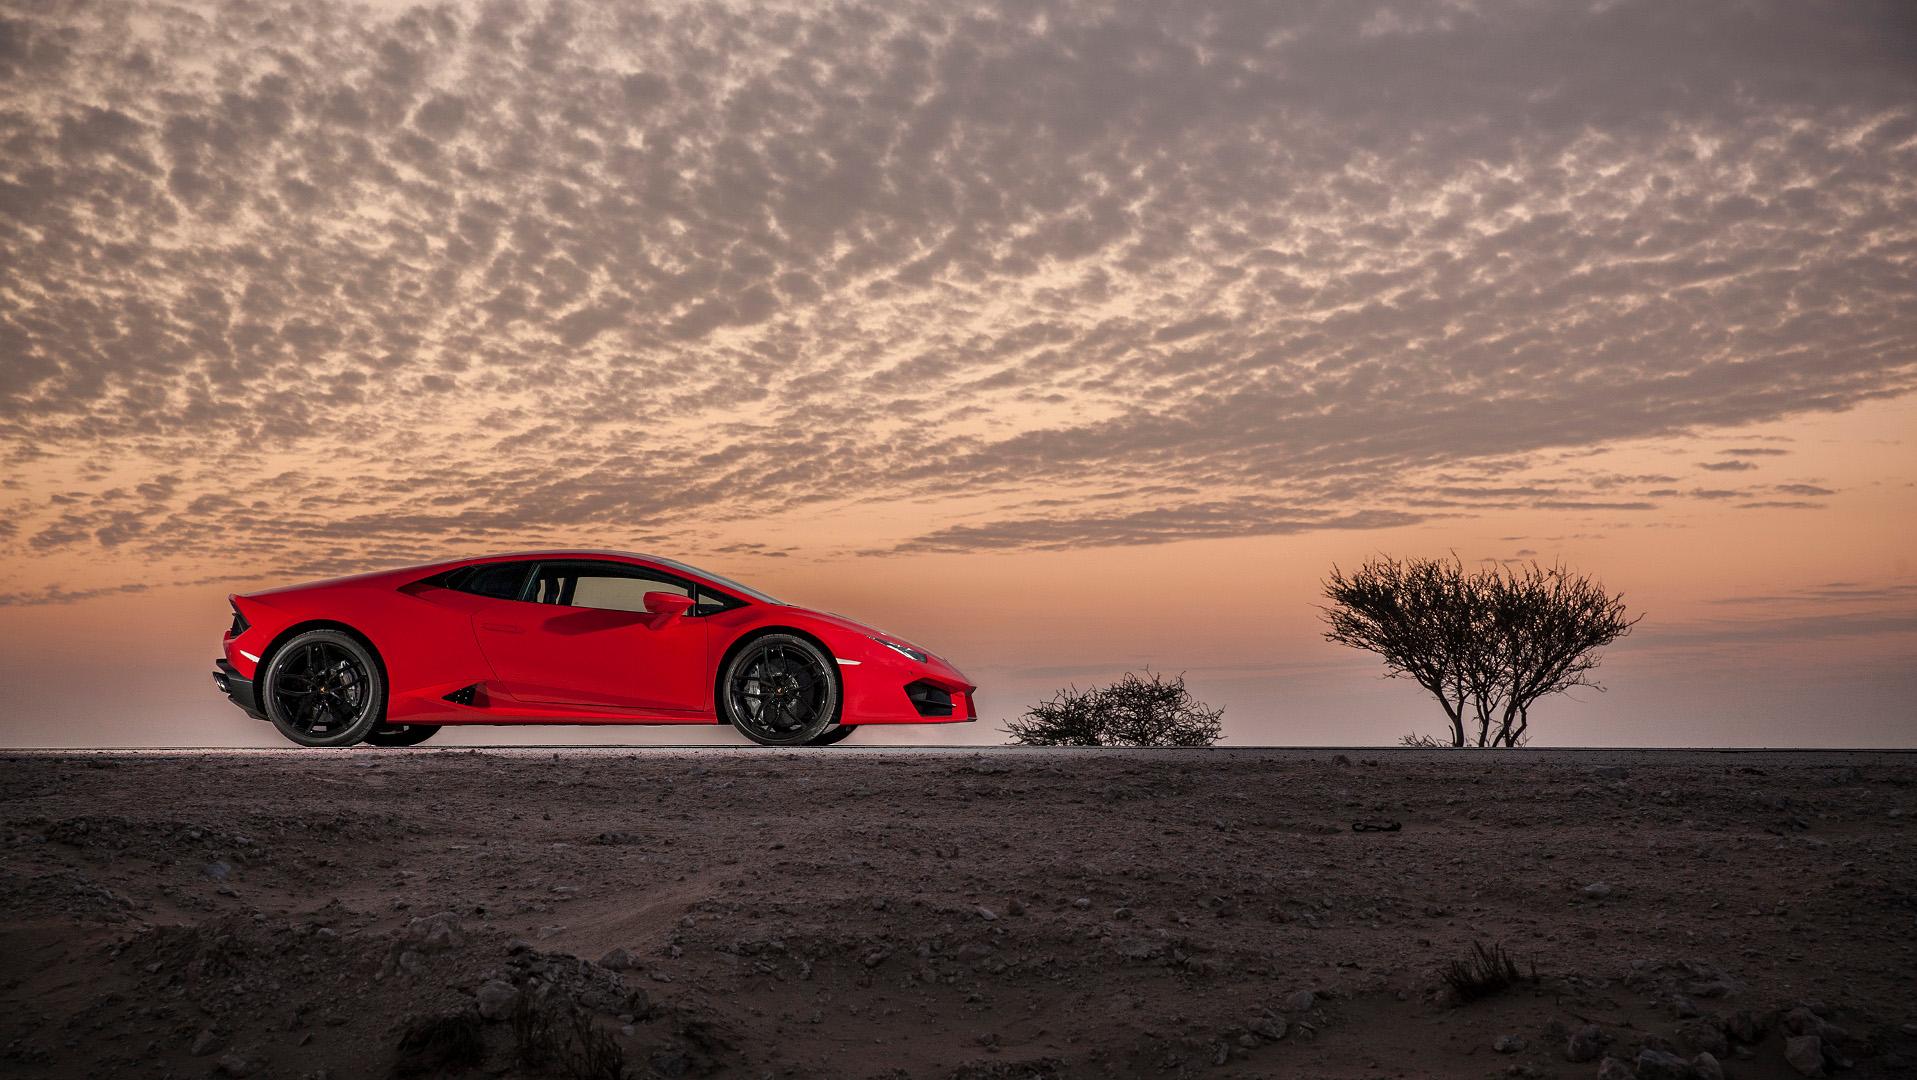 New Model Perspective Lamborghini Huracán Lp 580 2